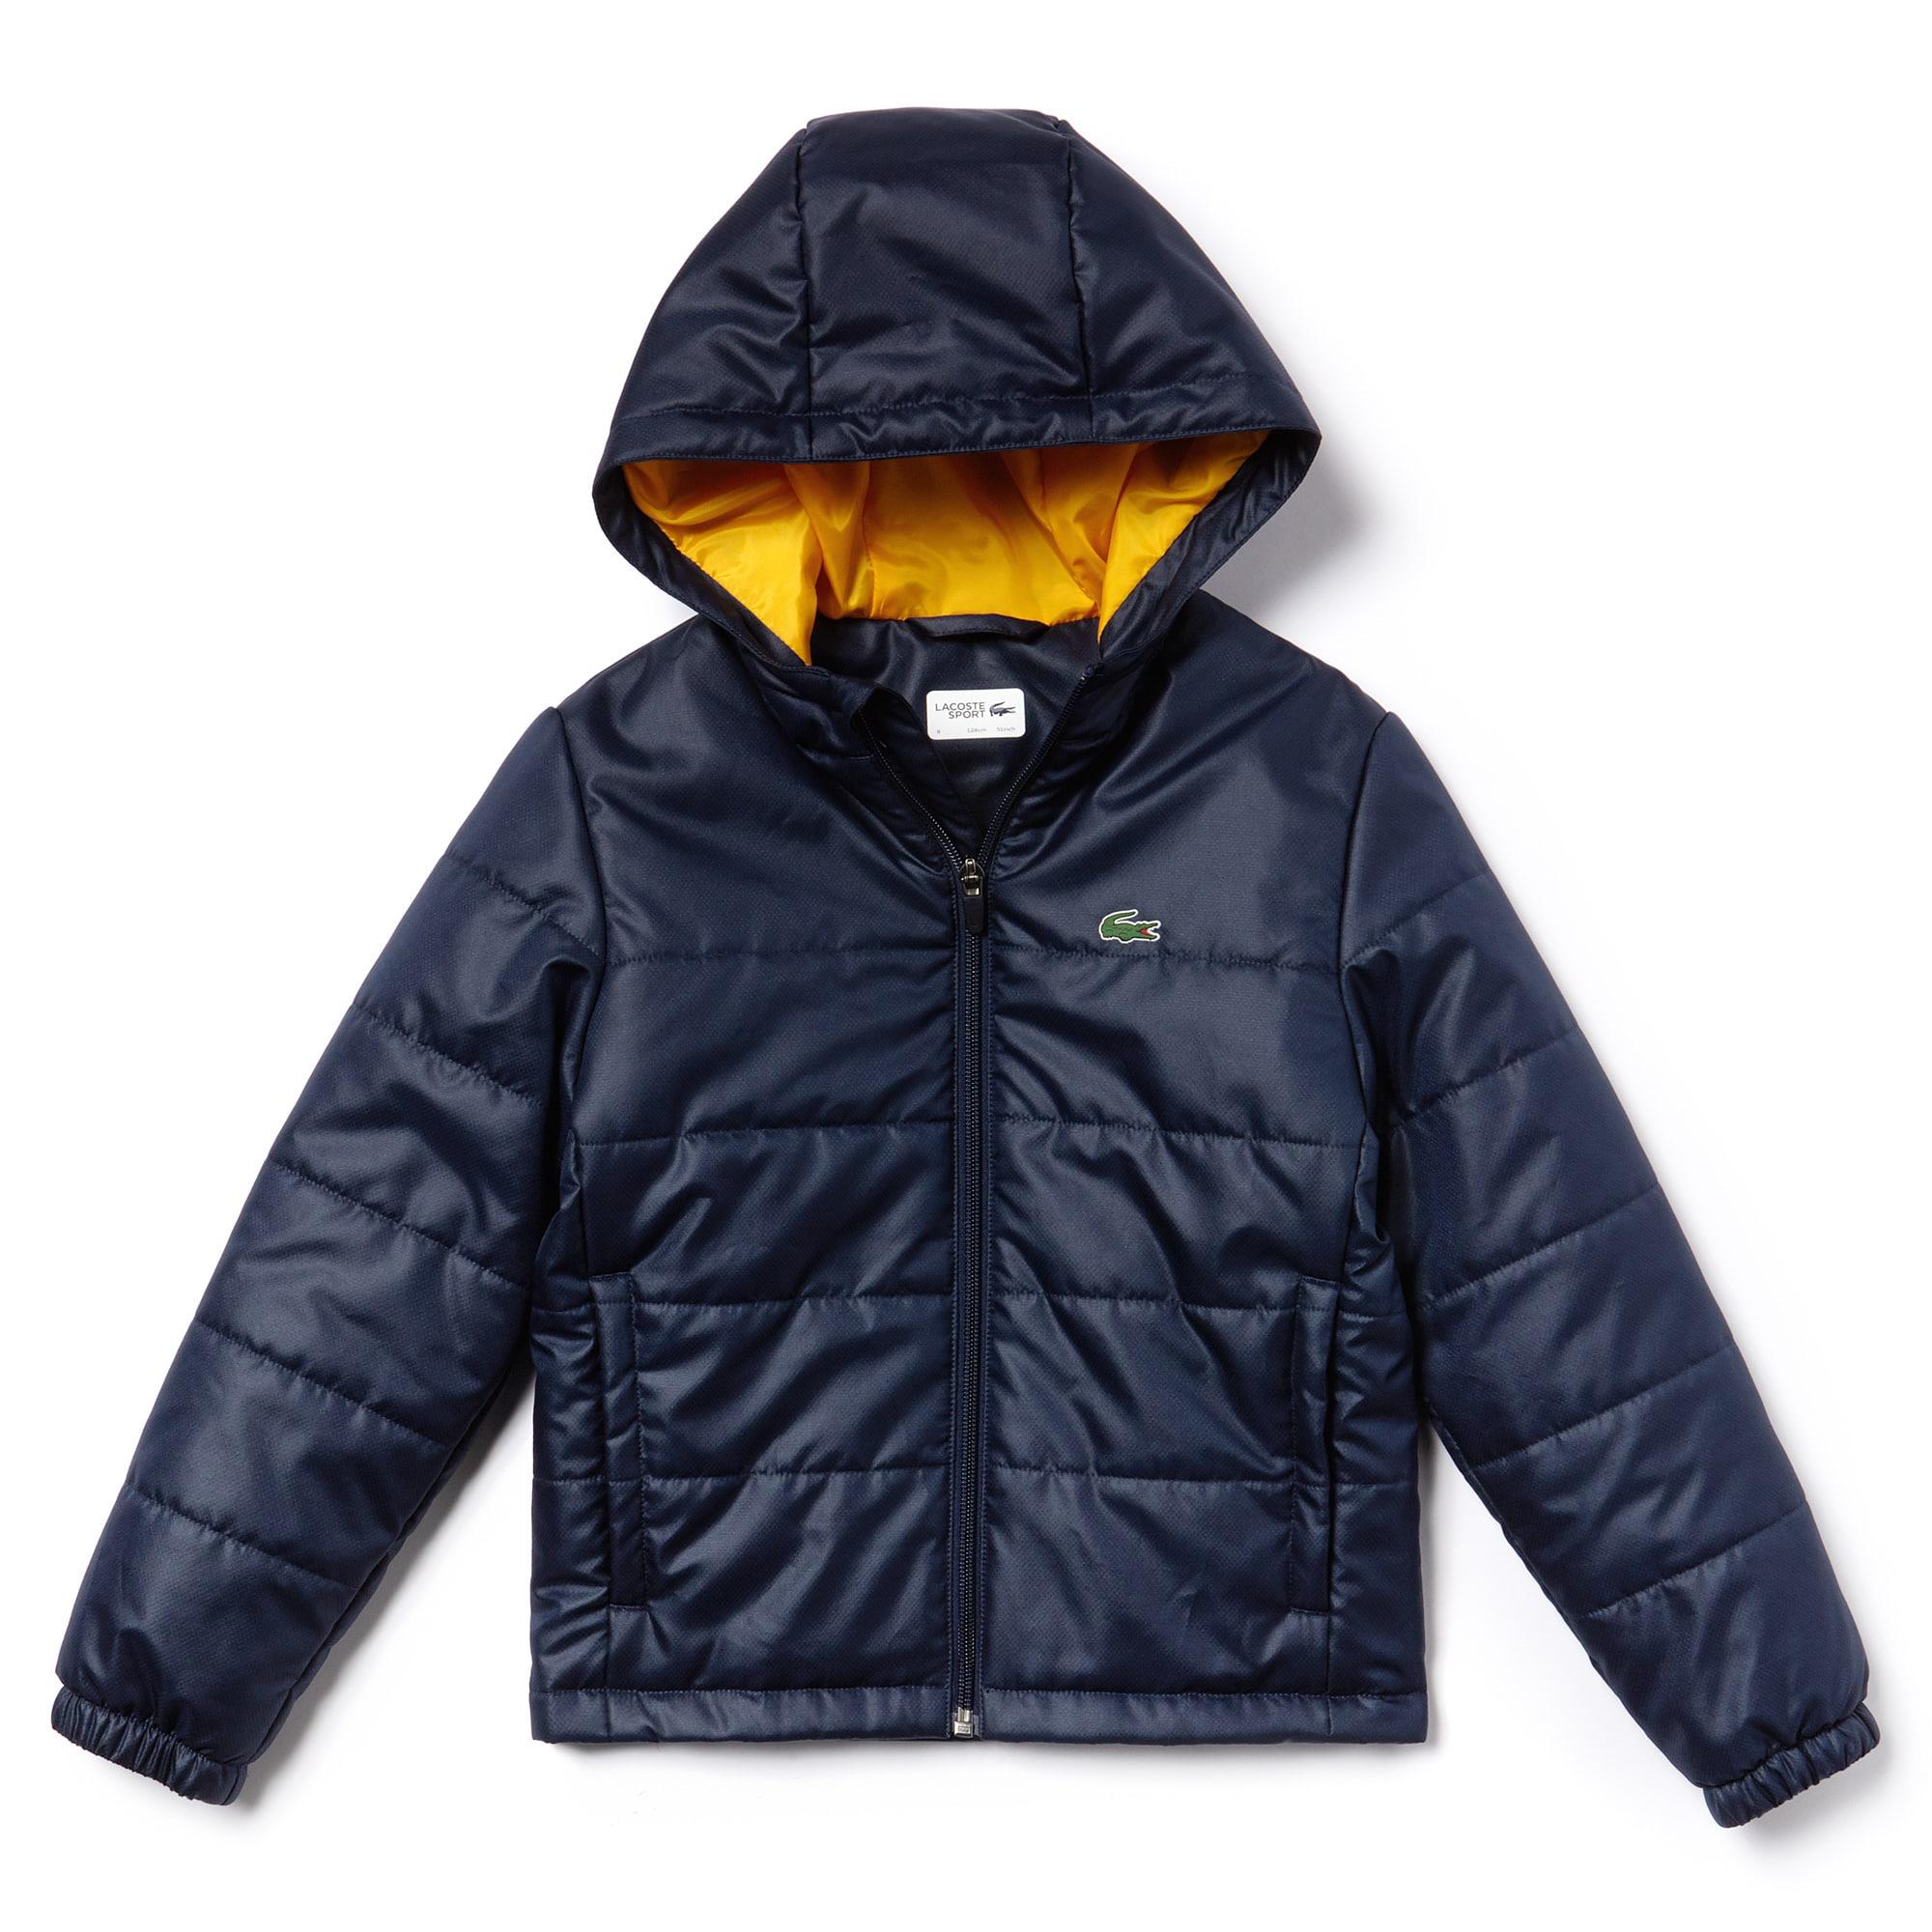 bfa4472696 Boys' SPORT Hooded Quilted Taffeta Tennis Jacket | LACOSTE